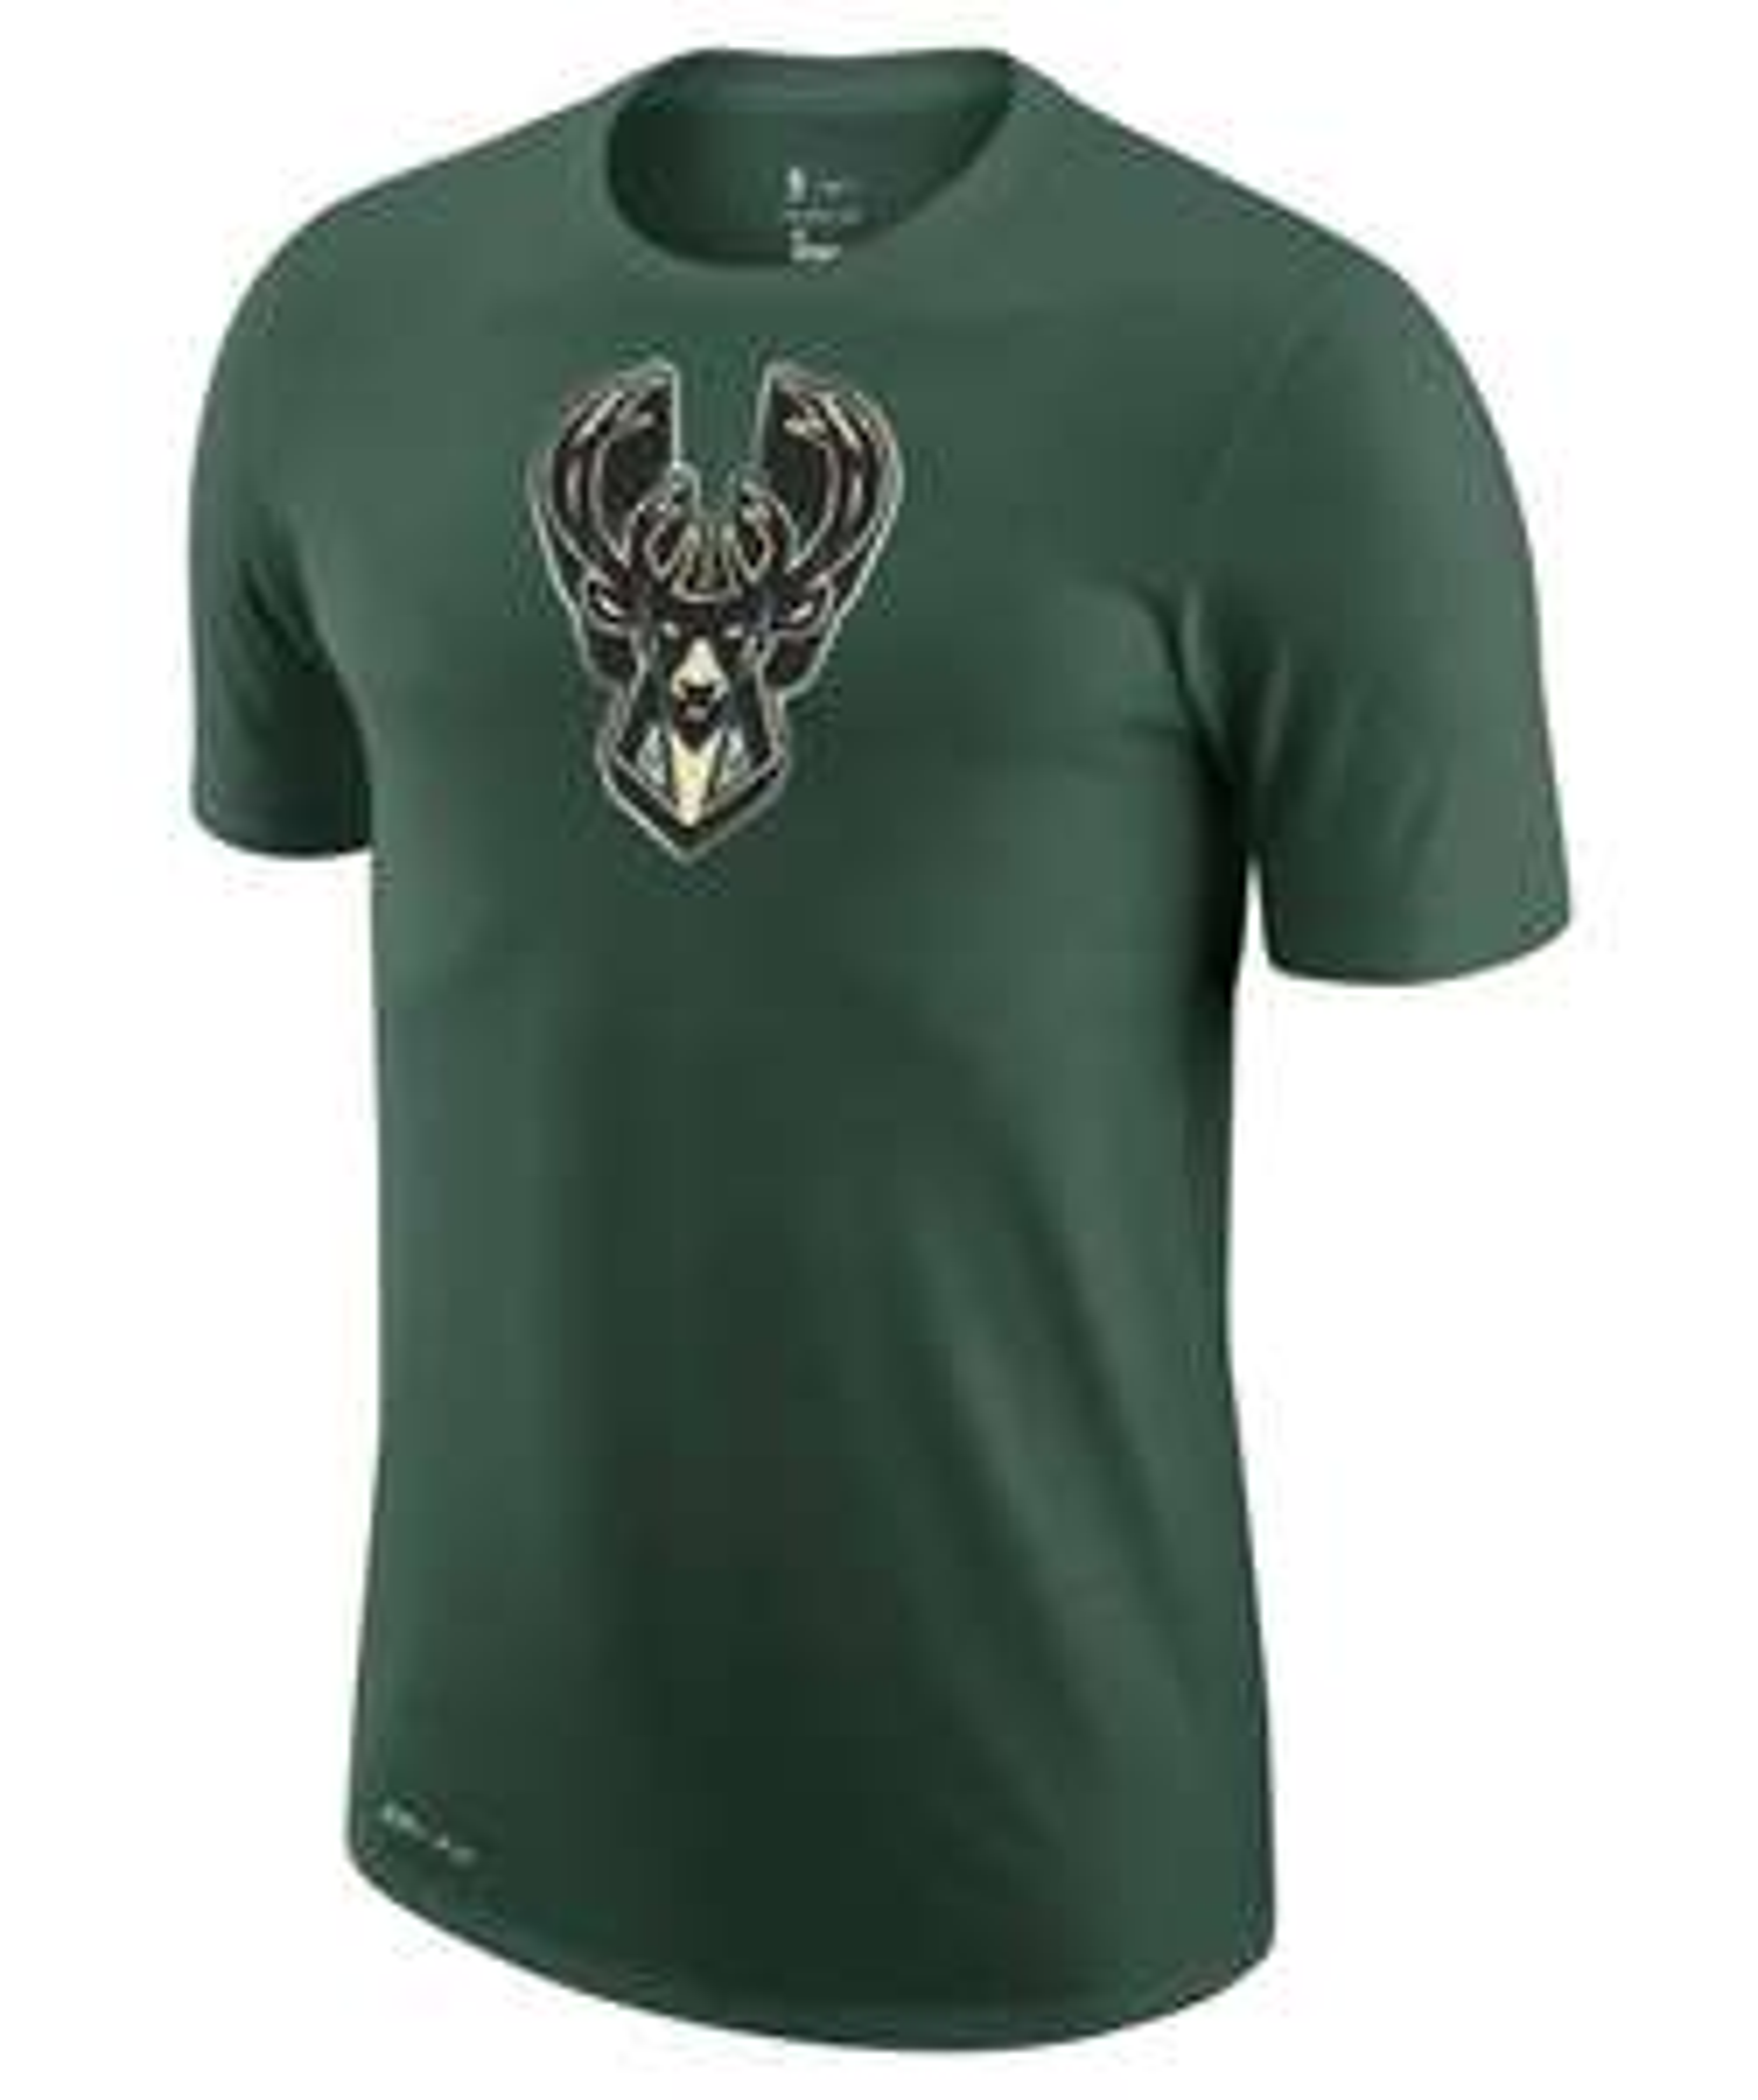 Nike Performance Herren T-Shirt ″NBA Milwaukee Bucks Earned Edition″ olive